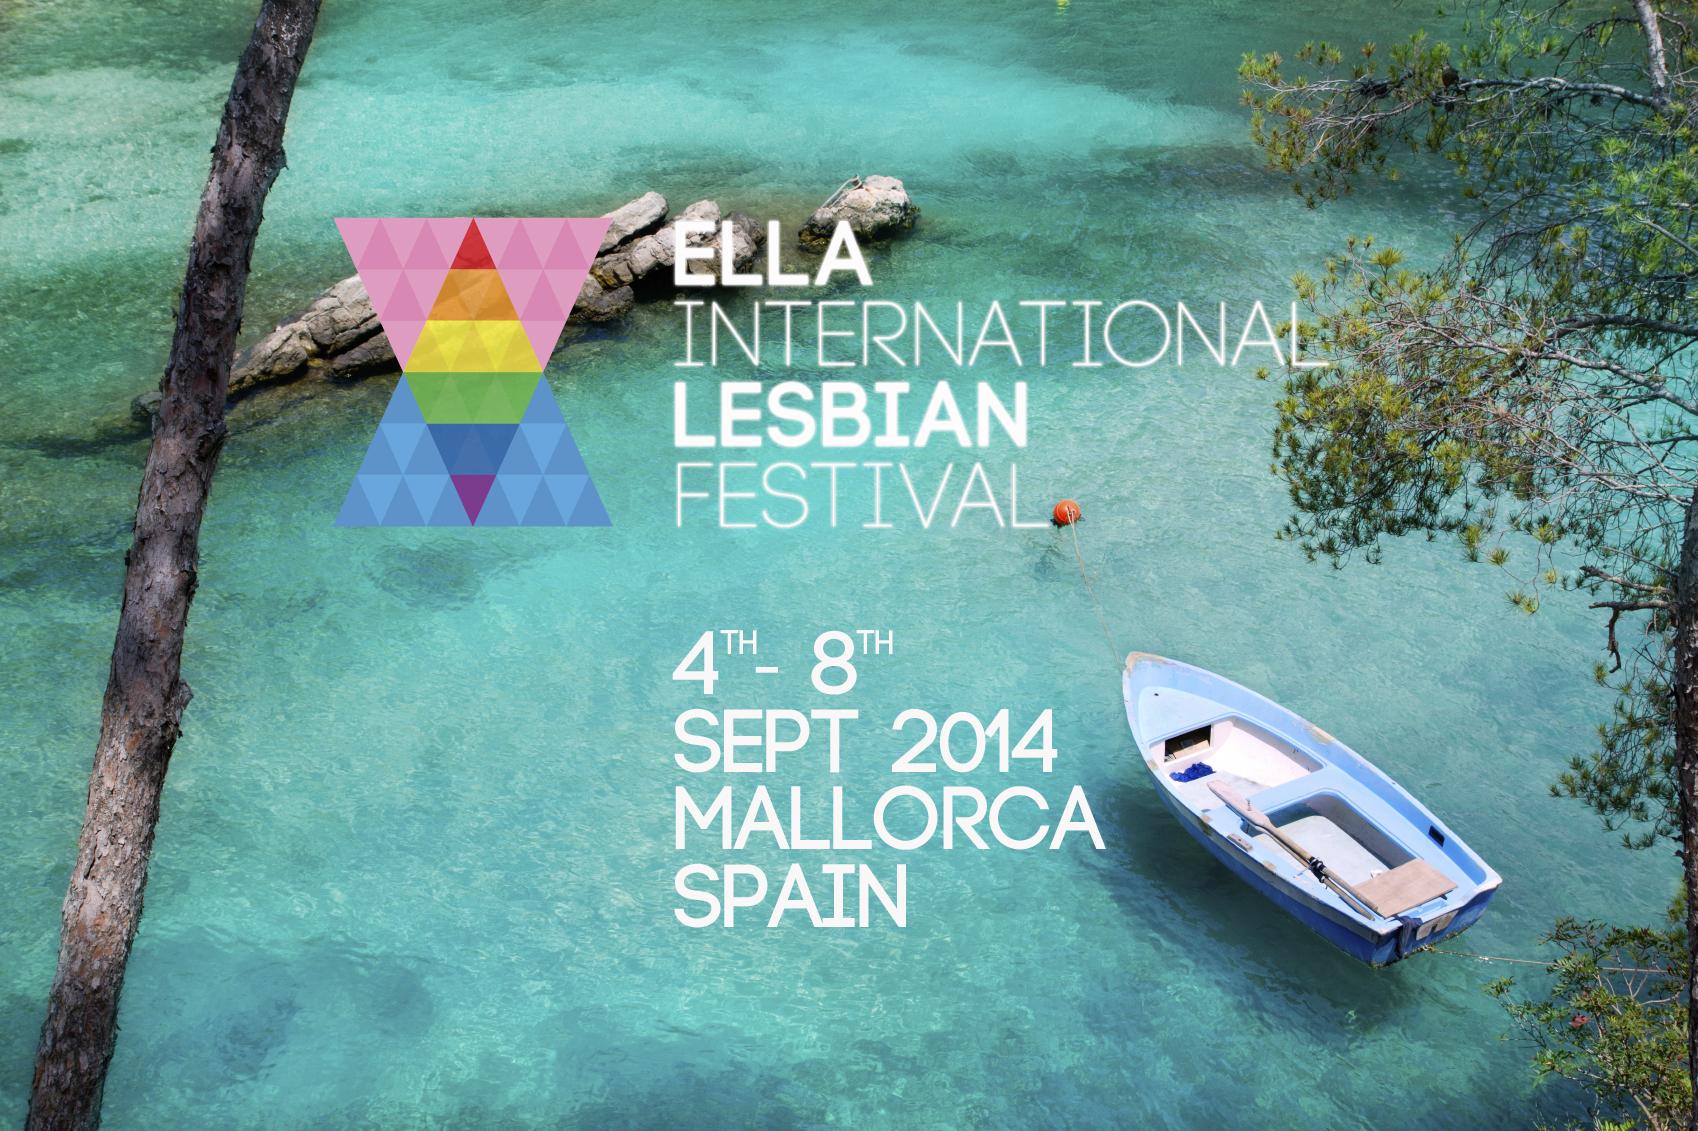 Festival Internacional Ella